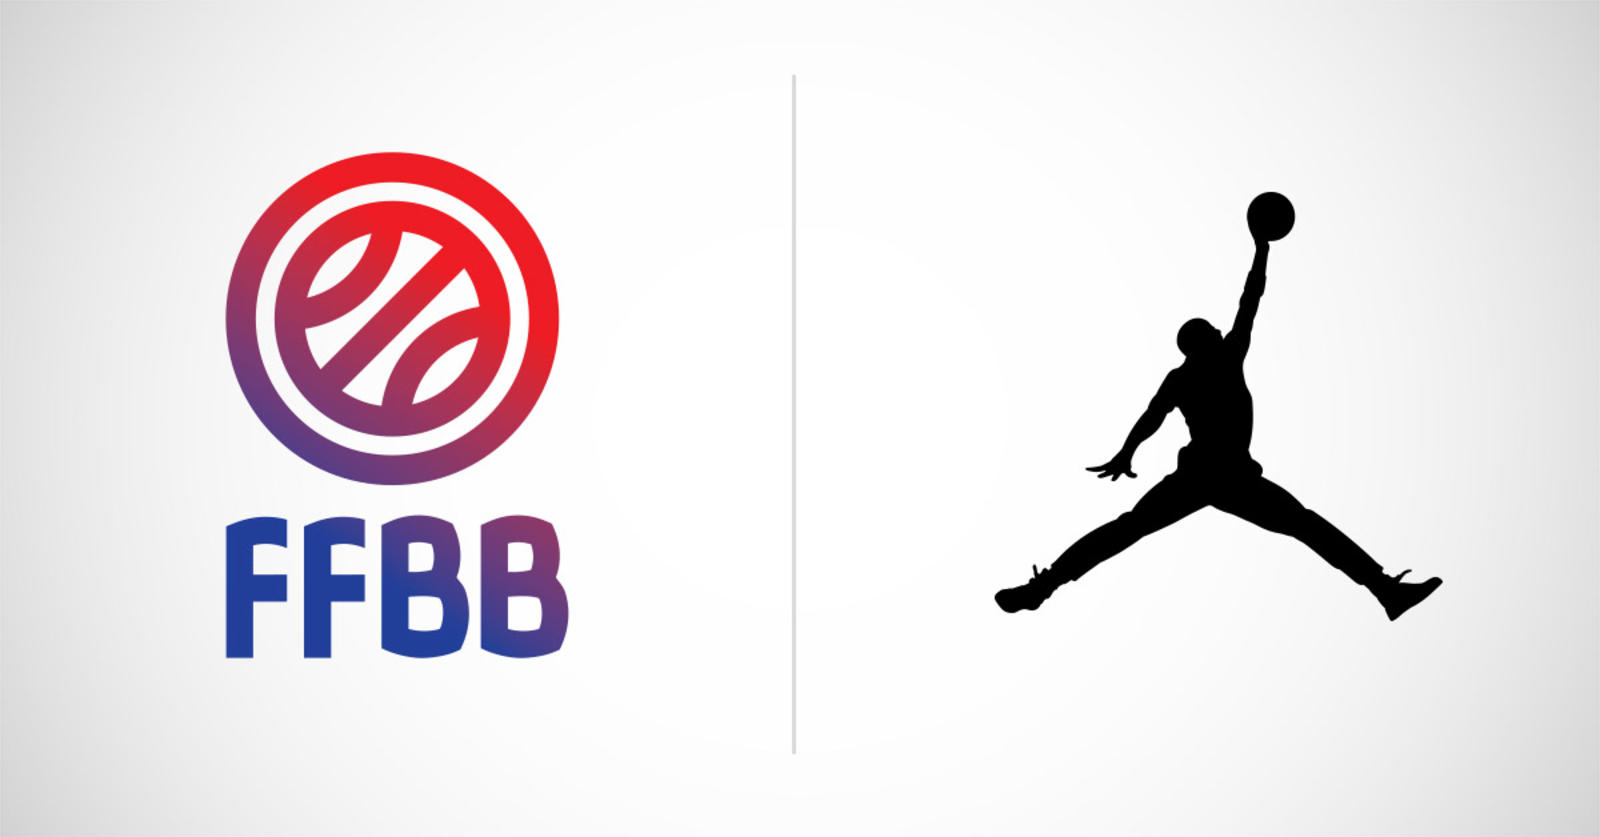 jordan brand ffbb partnership